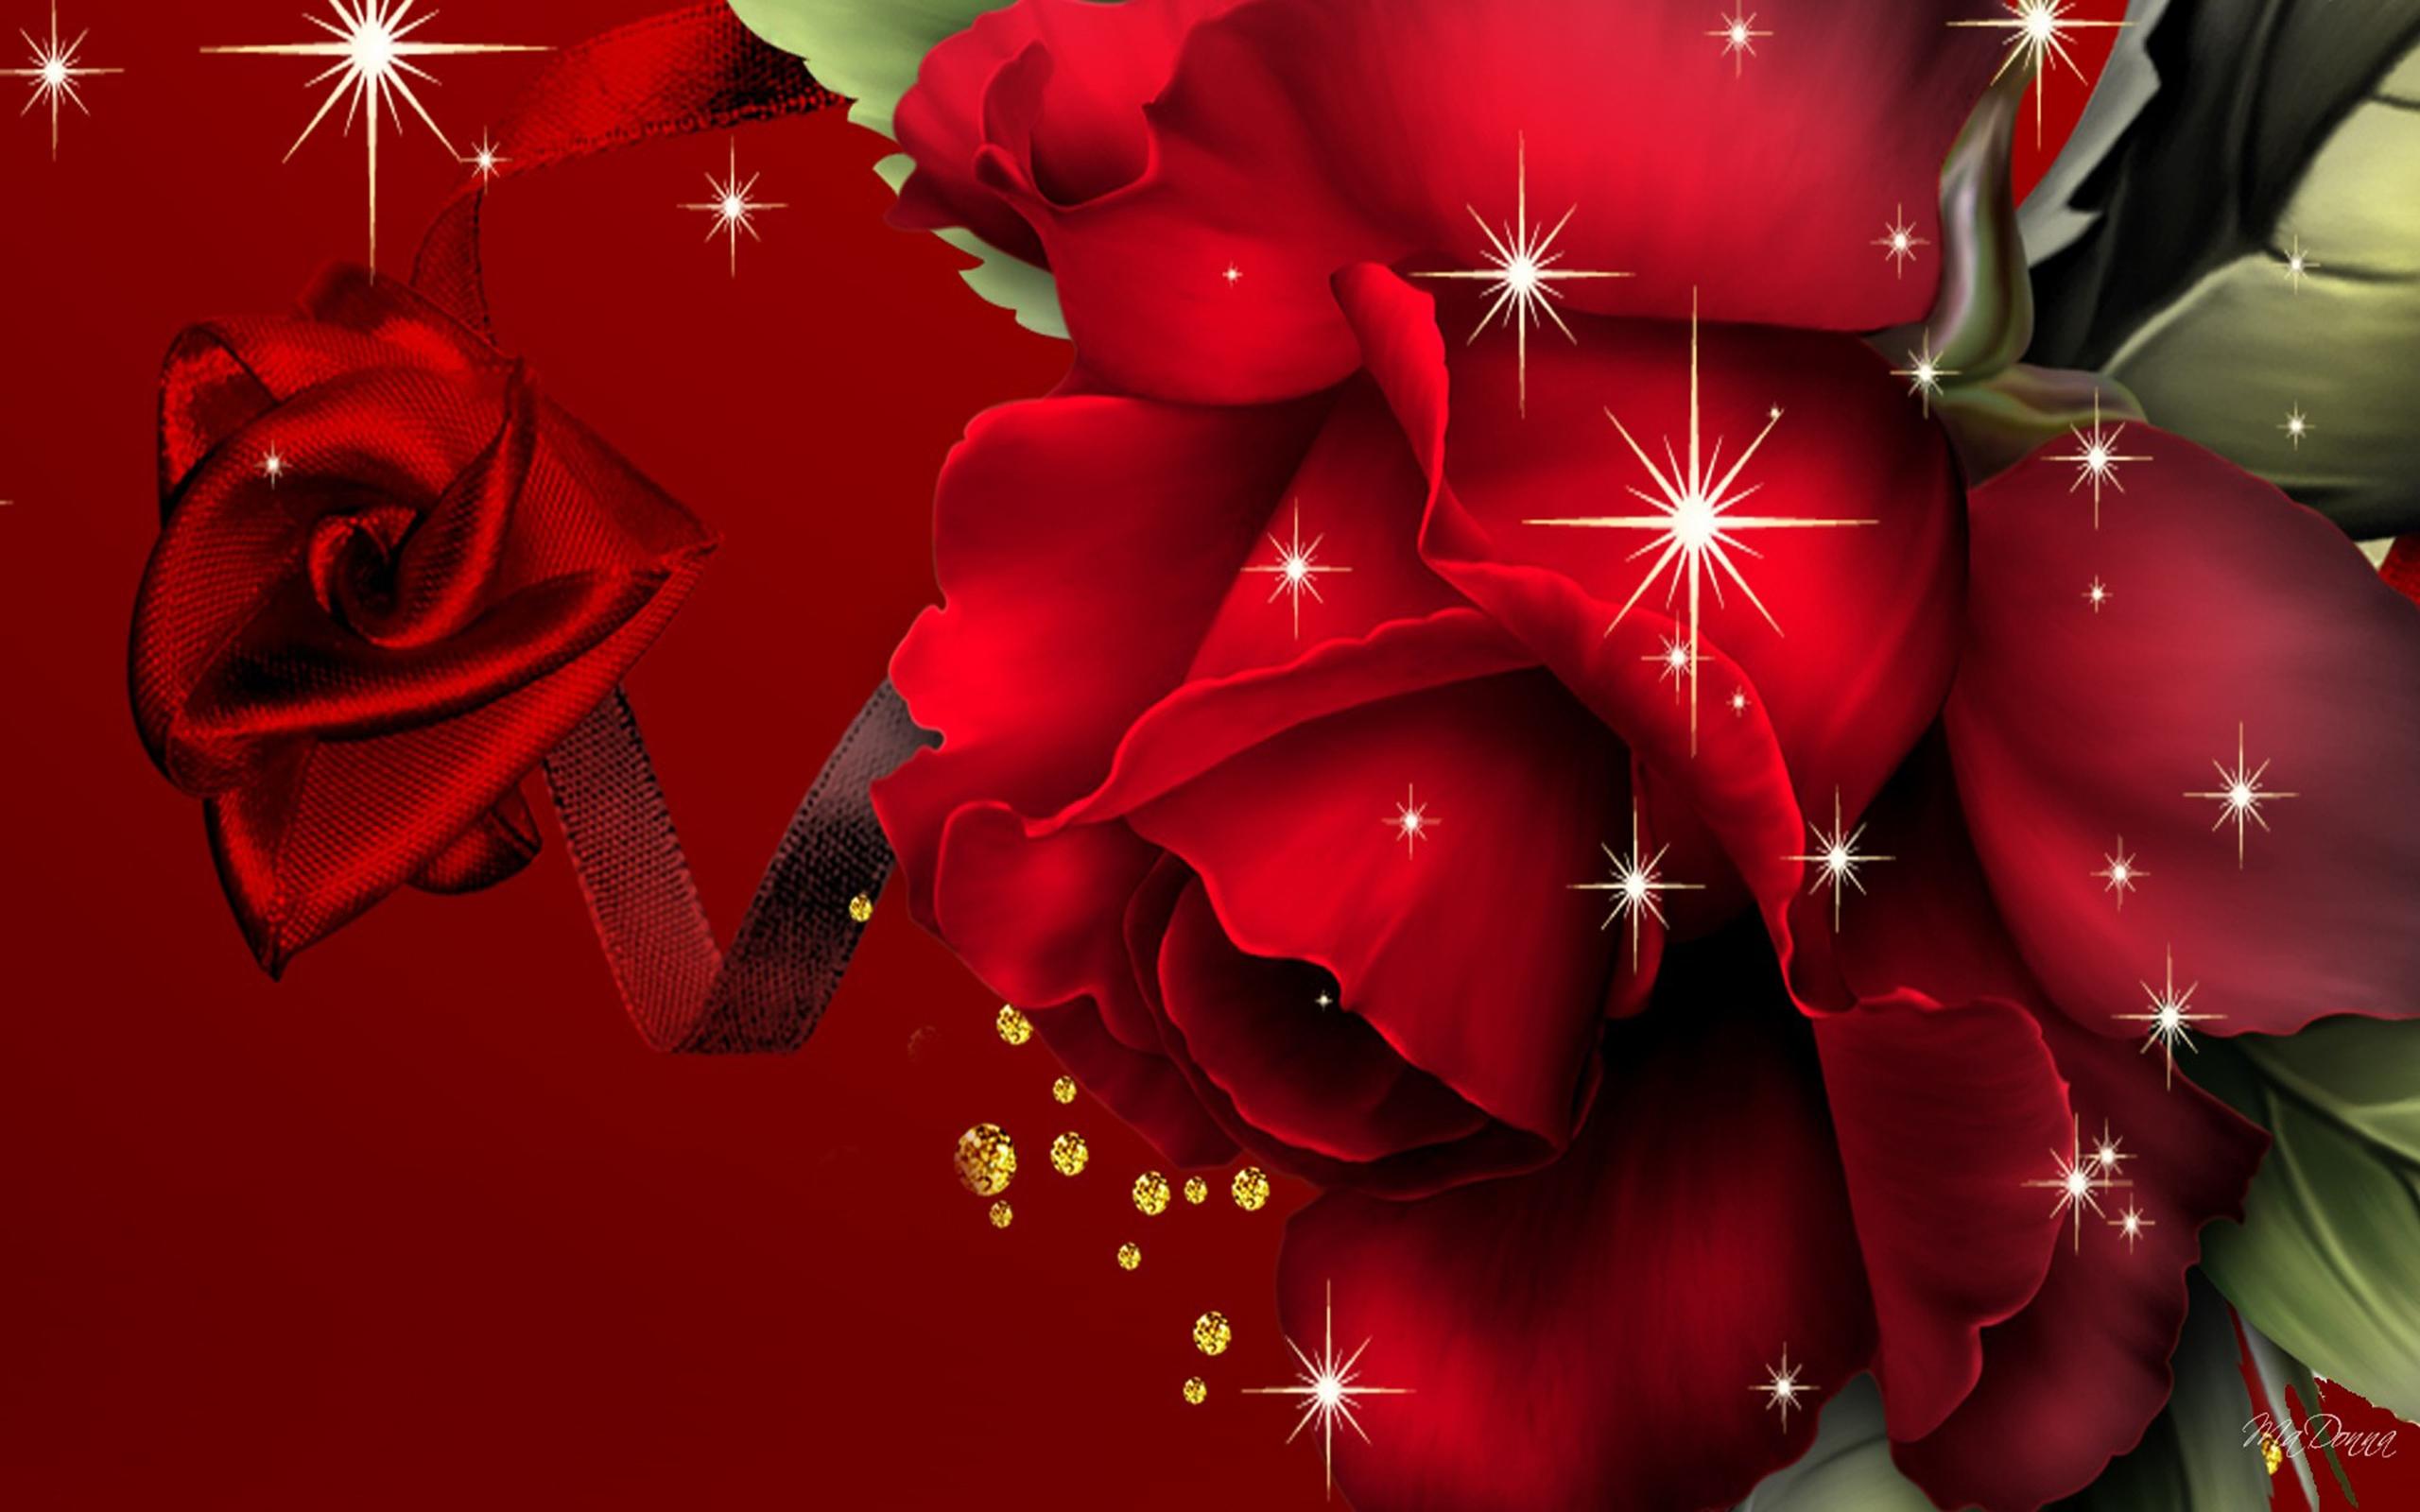 Background Red Rose Wallpaper Hd 2560x1600 Wallpaper Teahub Io